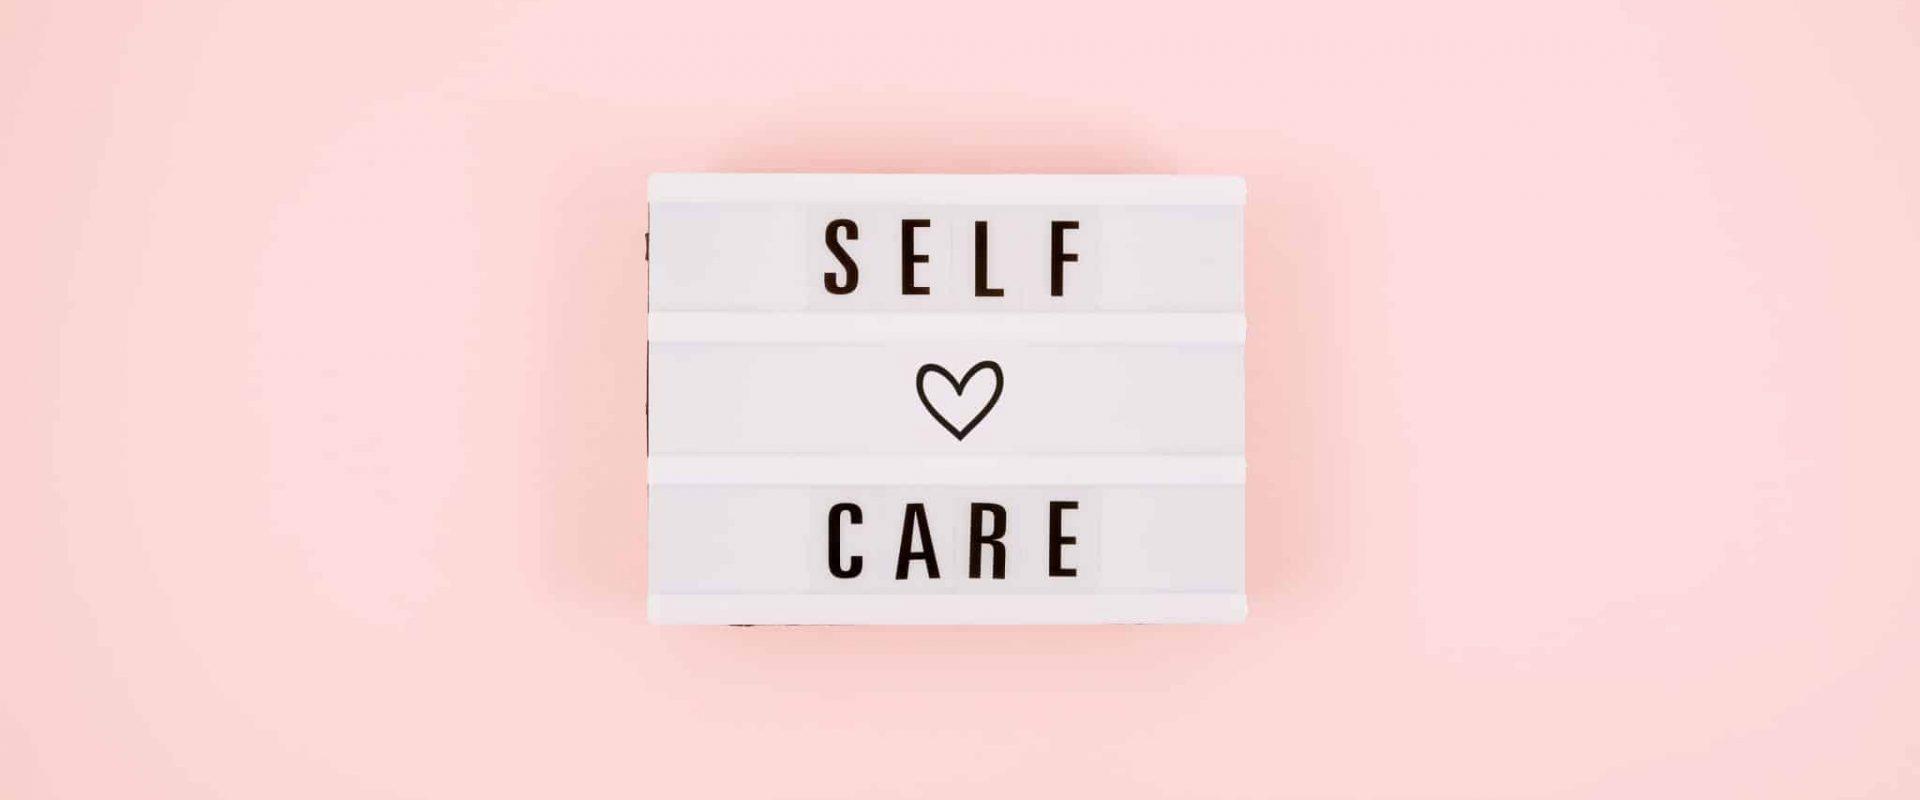 Self Care . Elementartraining